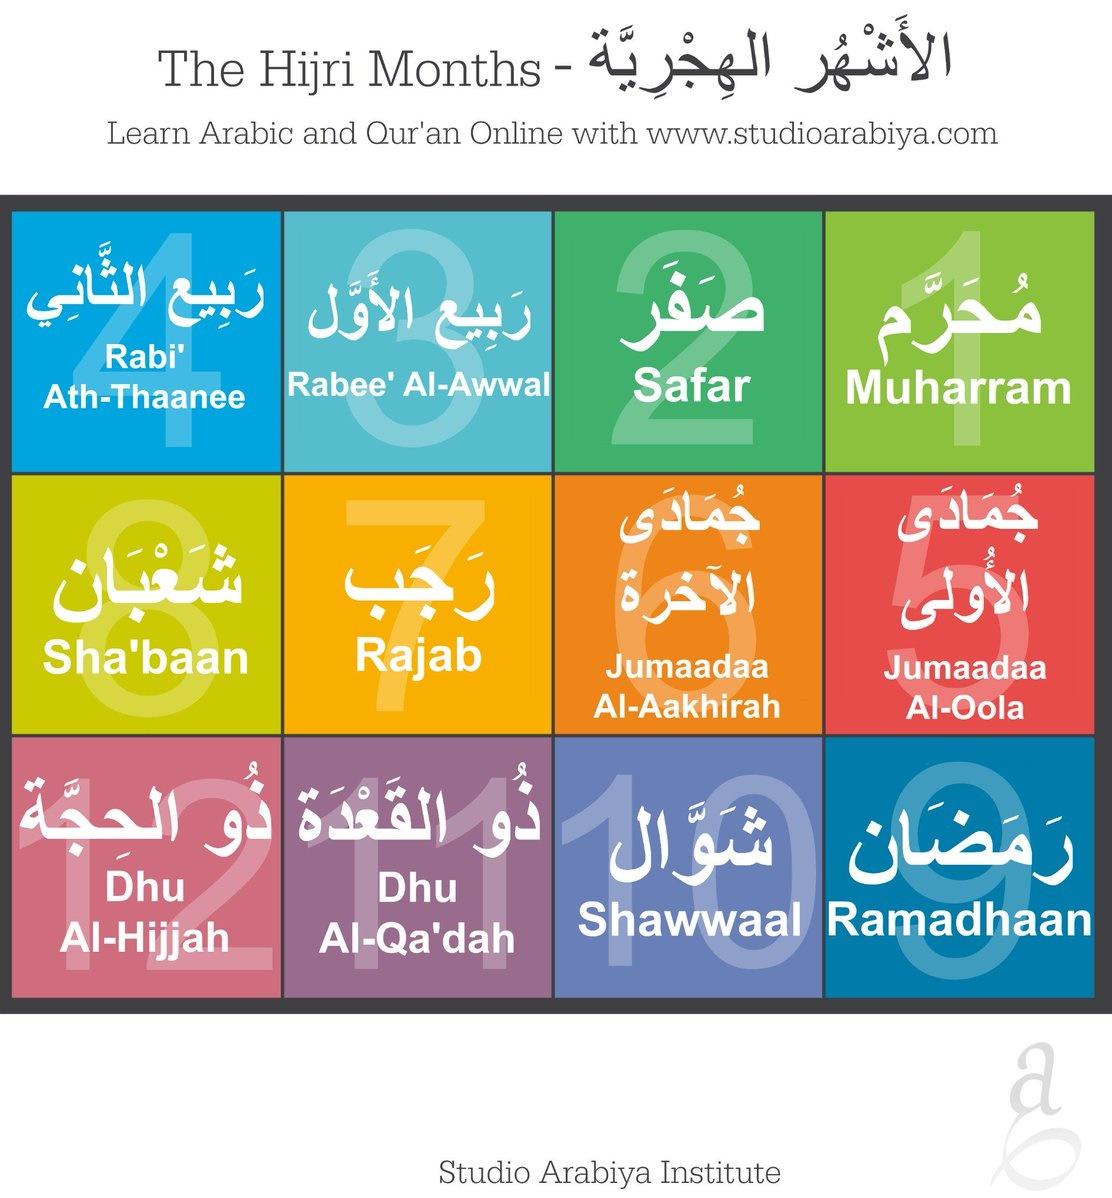 The Hijri Months! . . . #faith #religion #islam #studioarabiya #god #allah #islam #muslim #quran #arabic #education #onlineschool #understandquran #learnarabicpic.twitter.com/xp1M2aHgbH